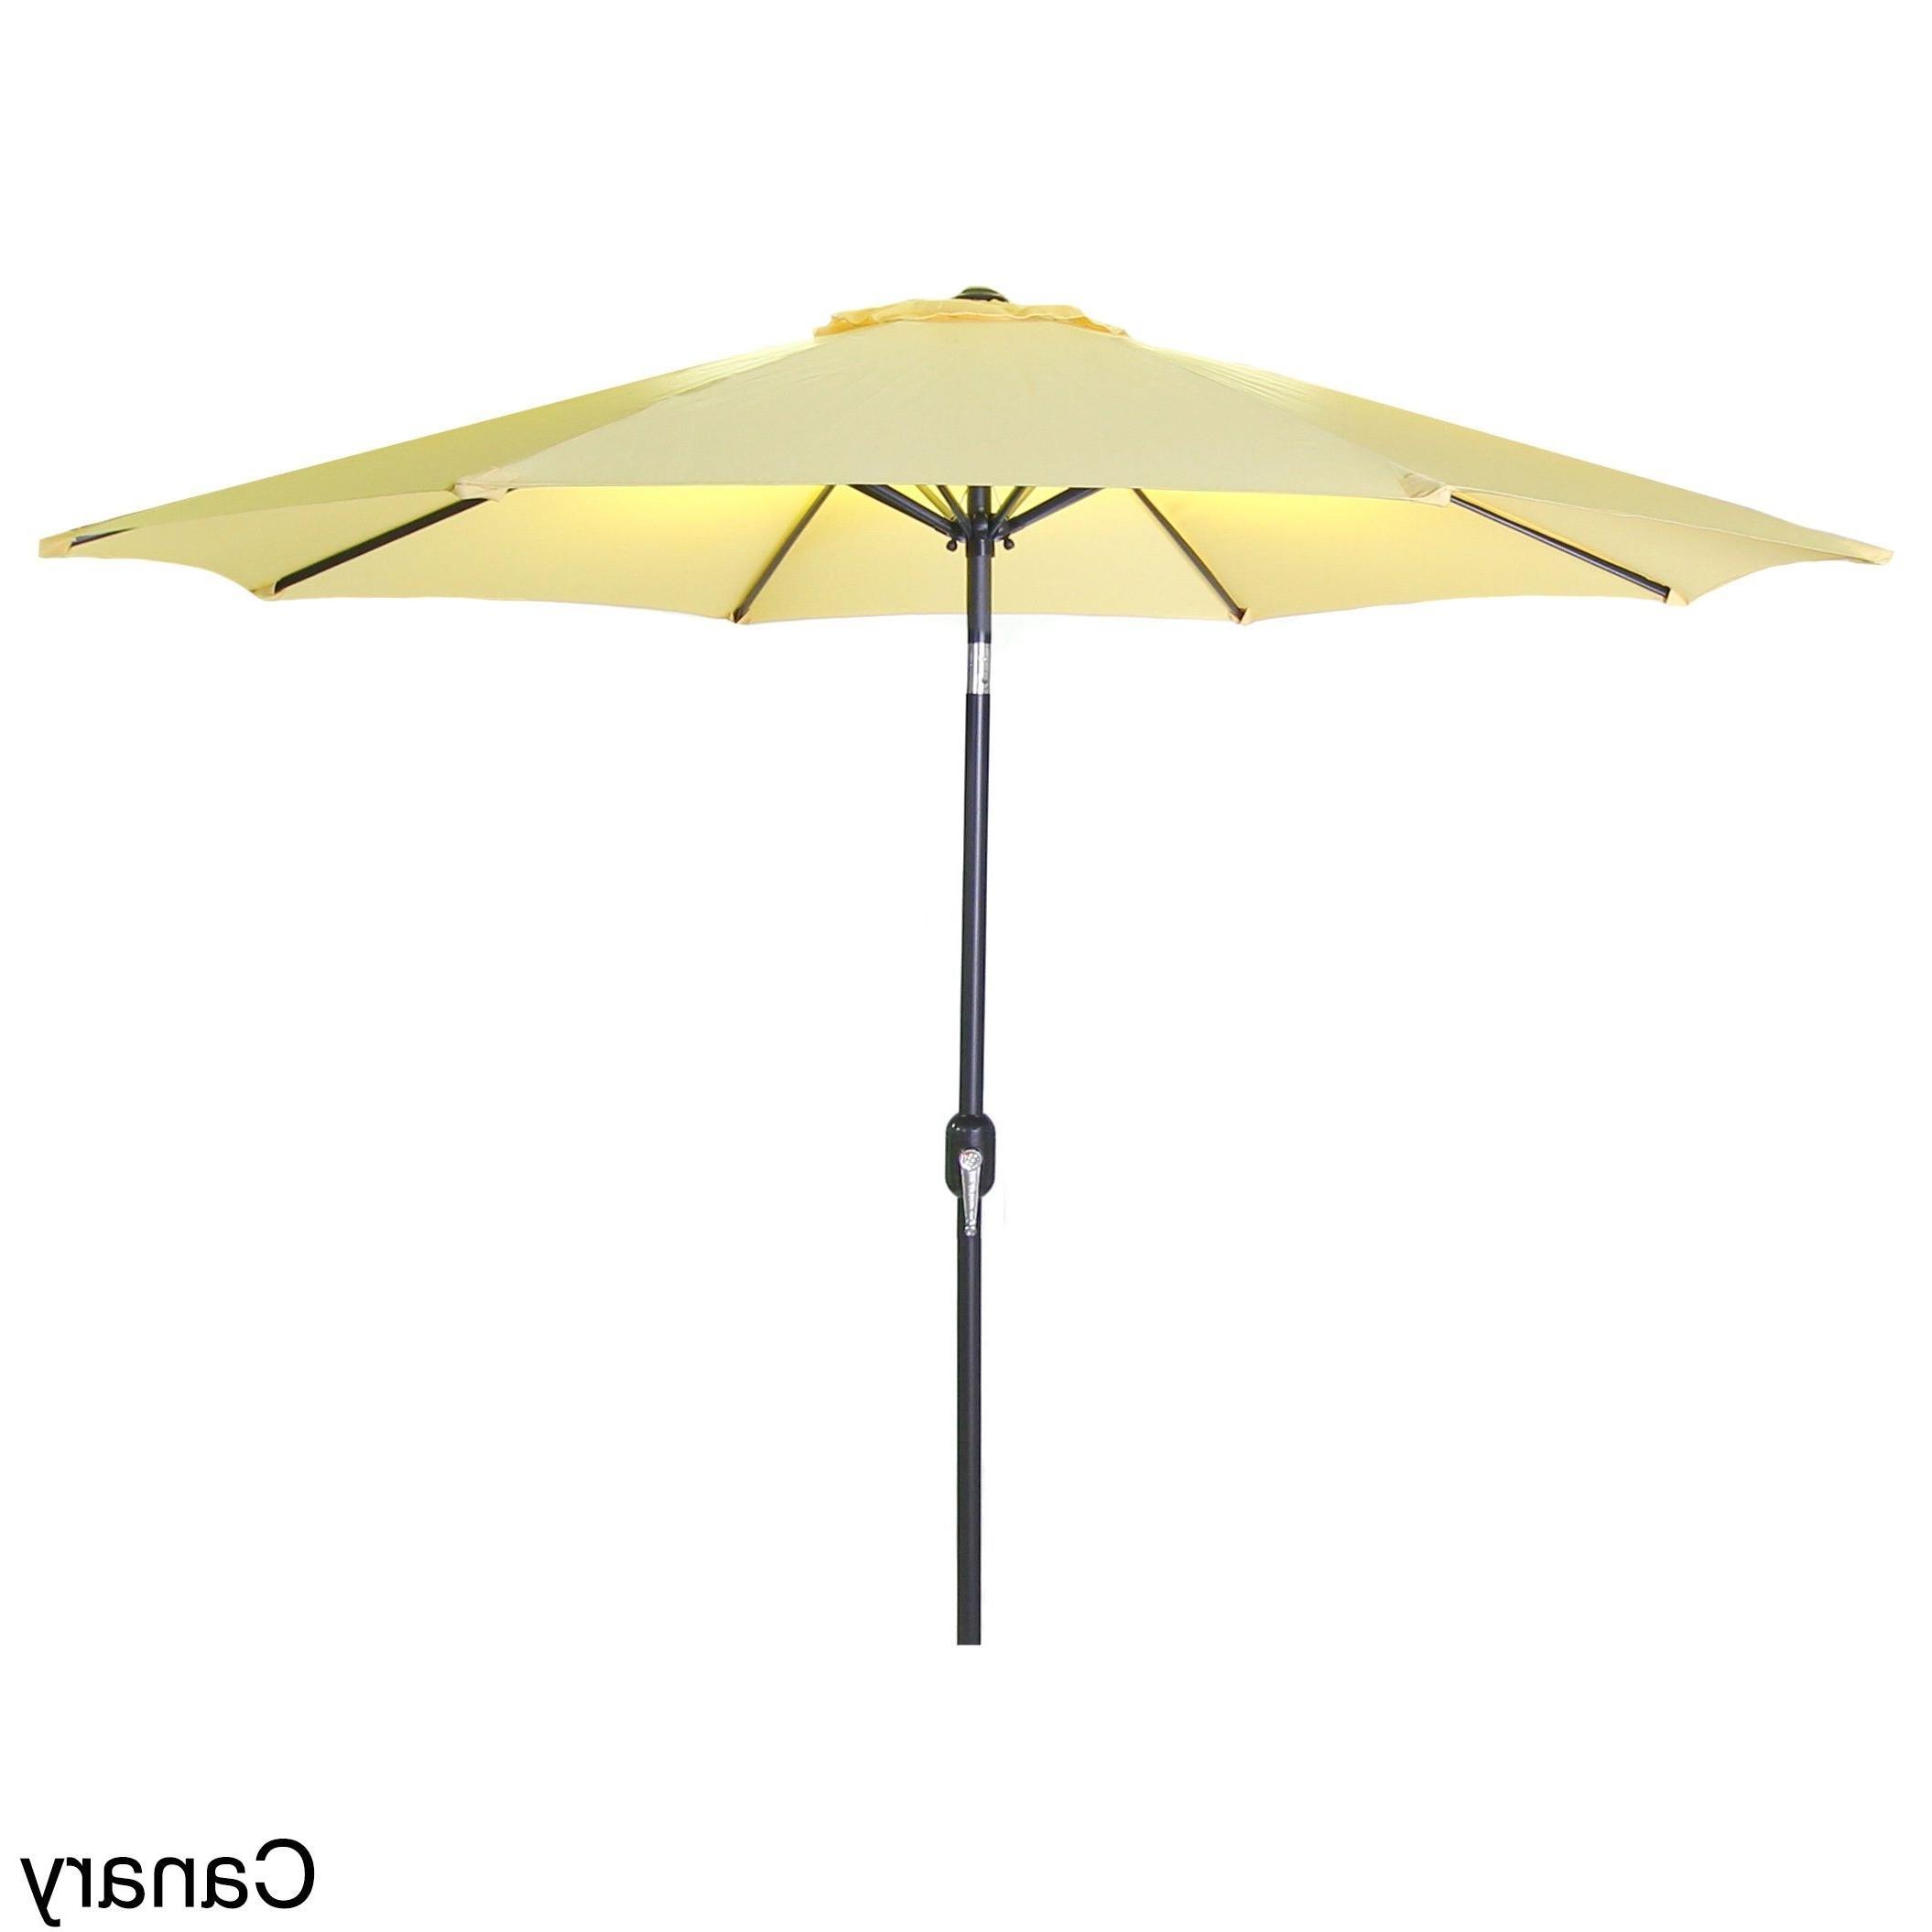 Jordan Patio Umbrellas Pertaining To Most Popular Jordan Manufacturing  (View 5 of 20)